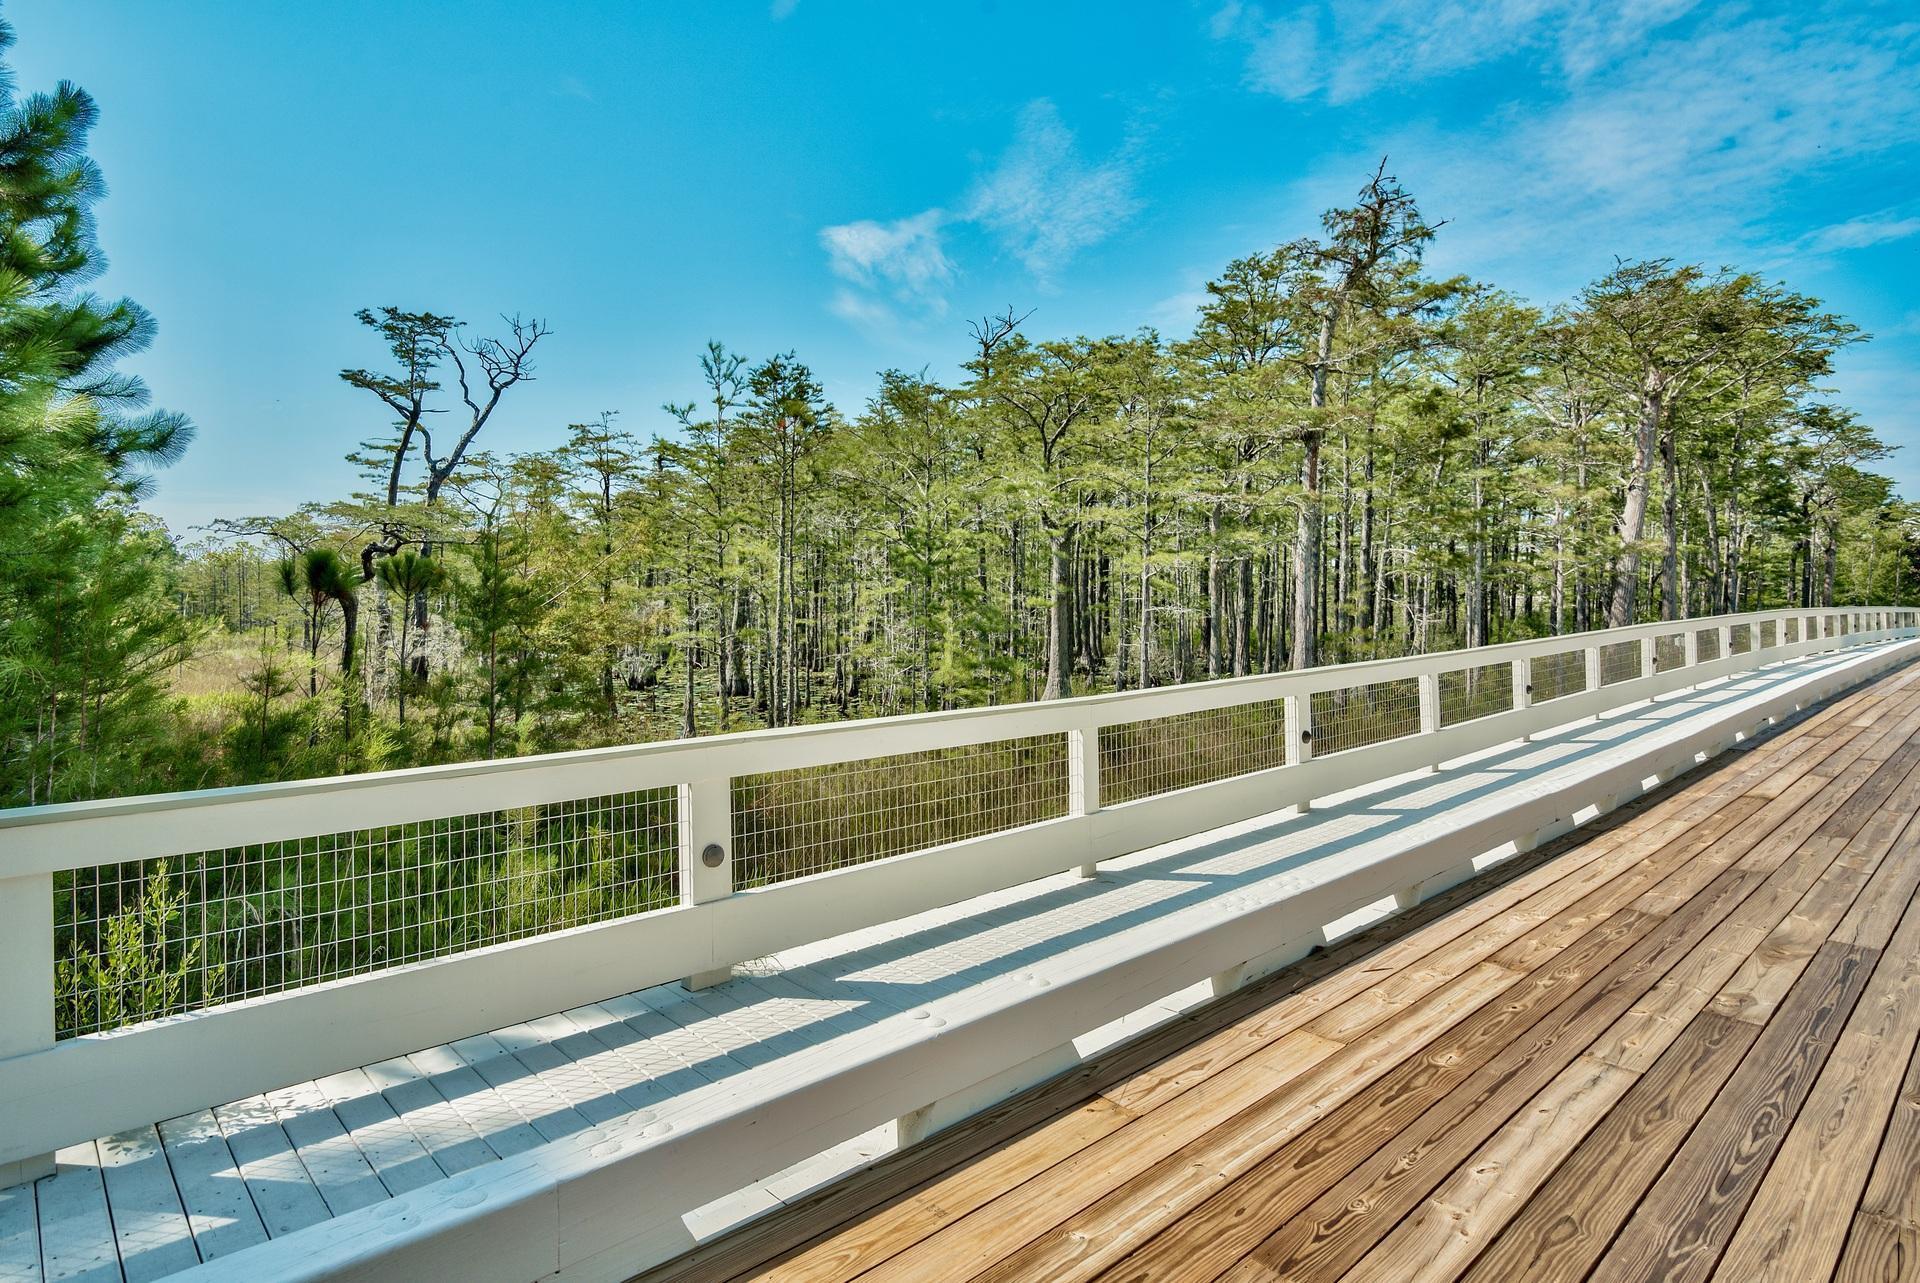 Cypress bridge over pond